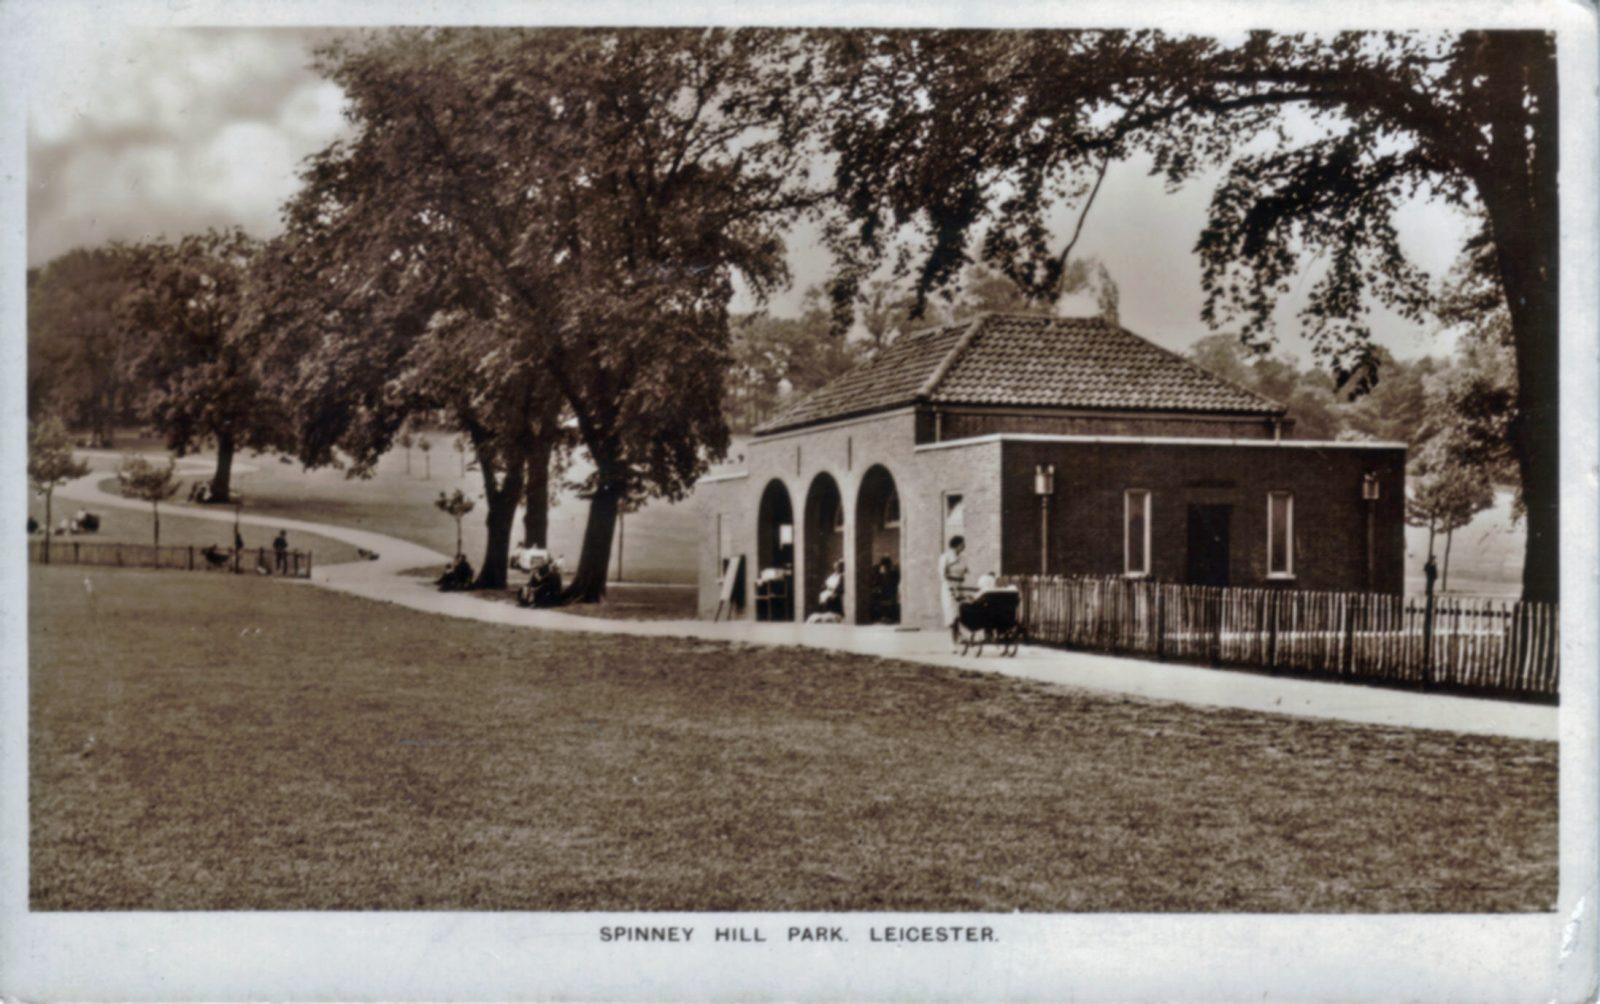 Spinney Hill Park, Leicester. 1921-1940: Public conveniences. (File:1061)